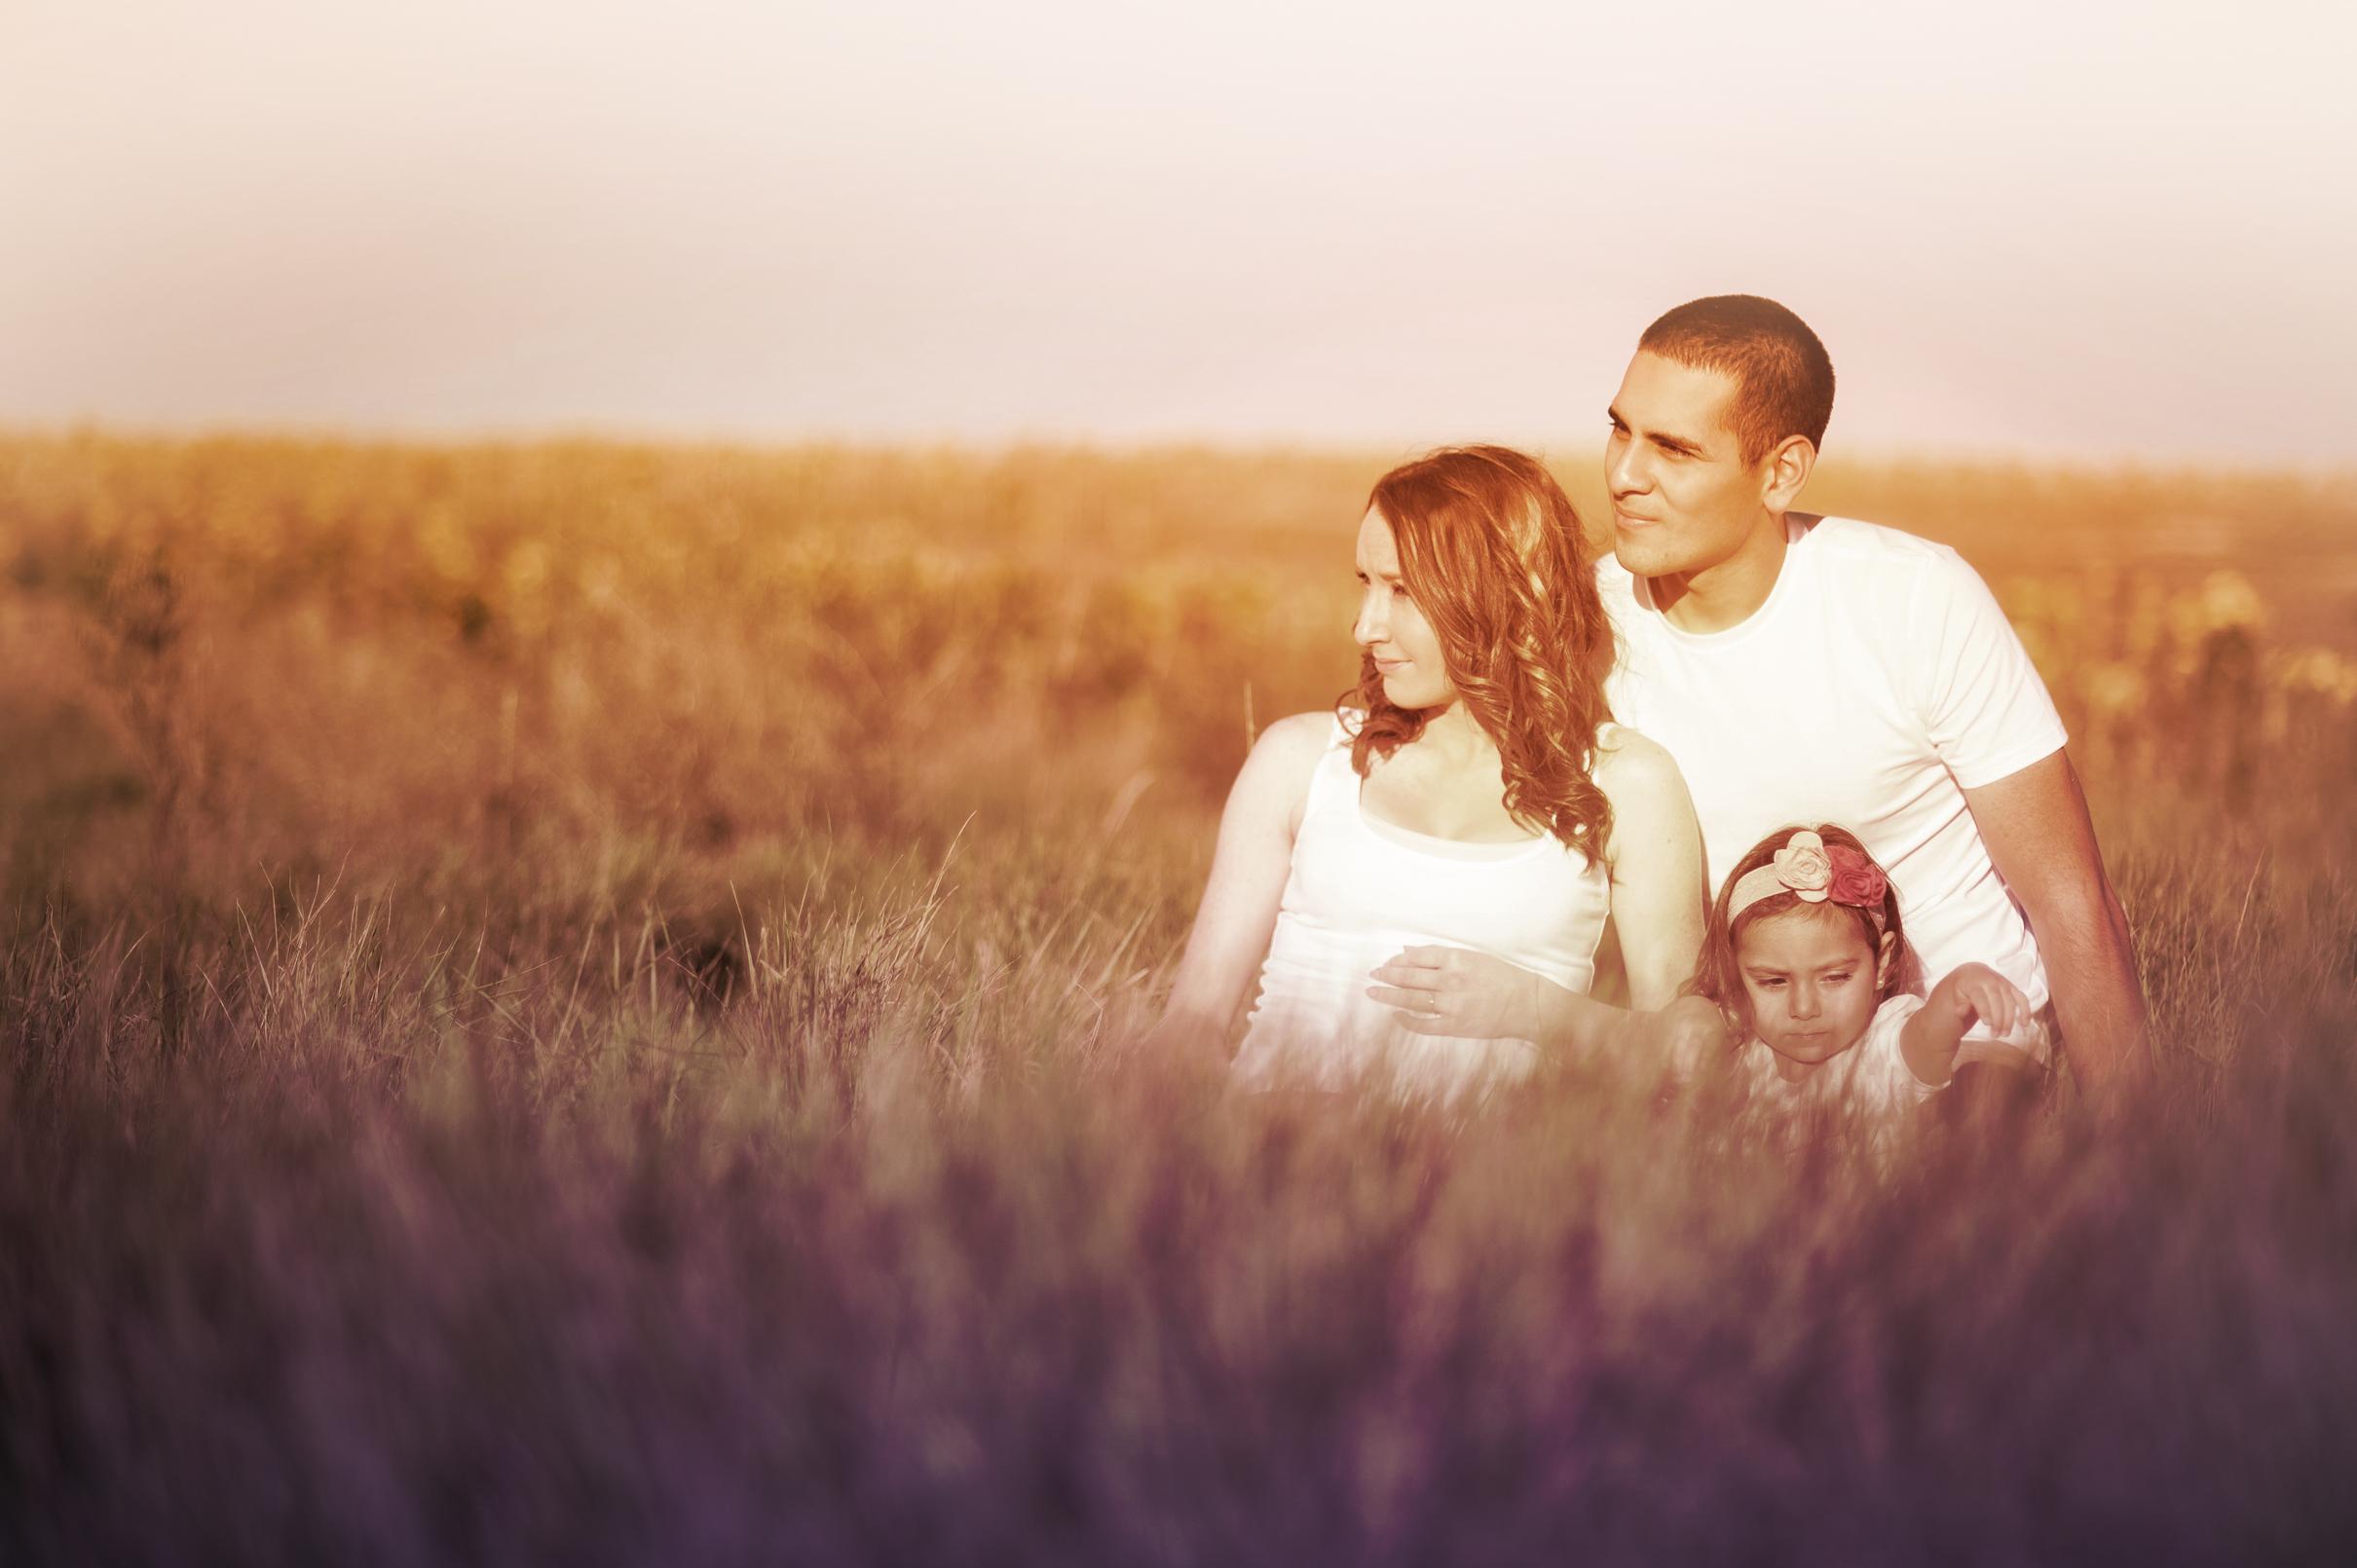 Family of Three in the Prairie, Adult, Outdoor, Pretty, Prairie, HQ Photo